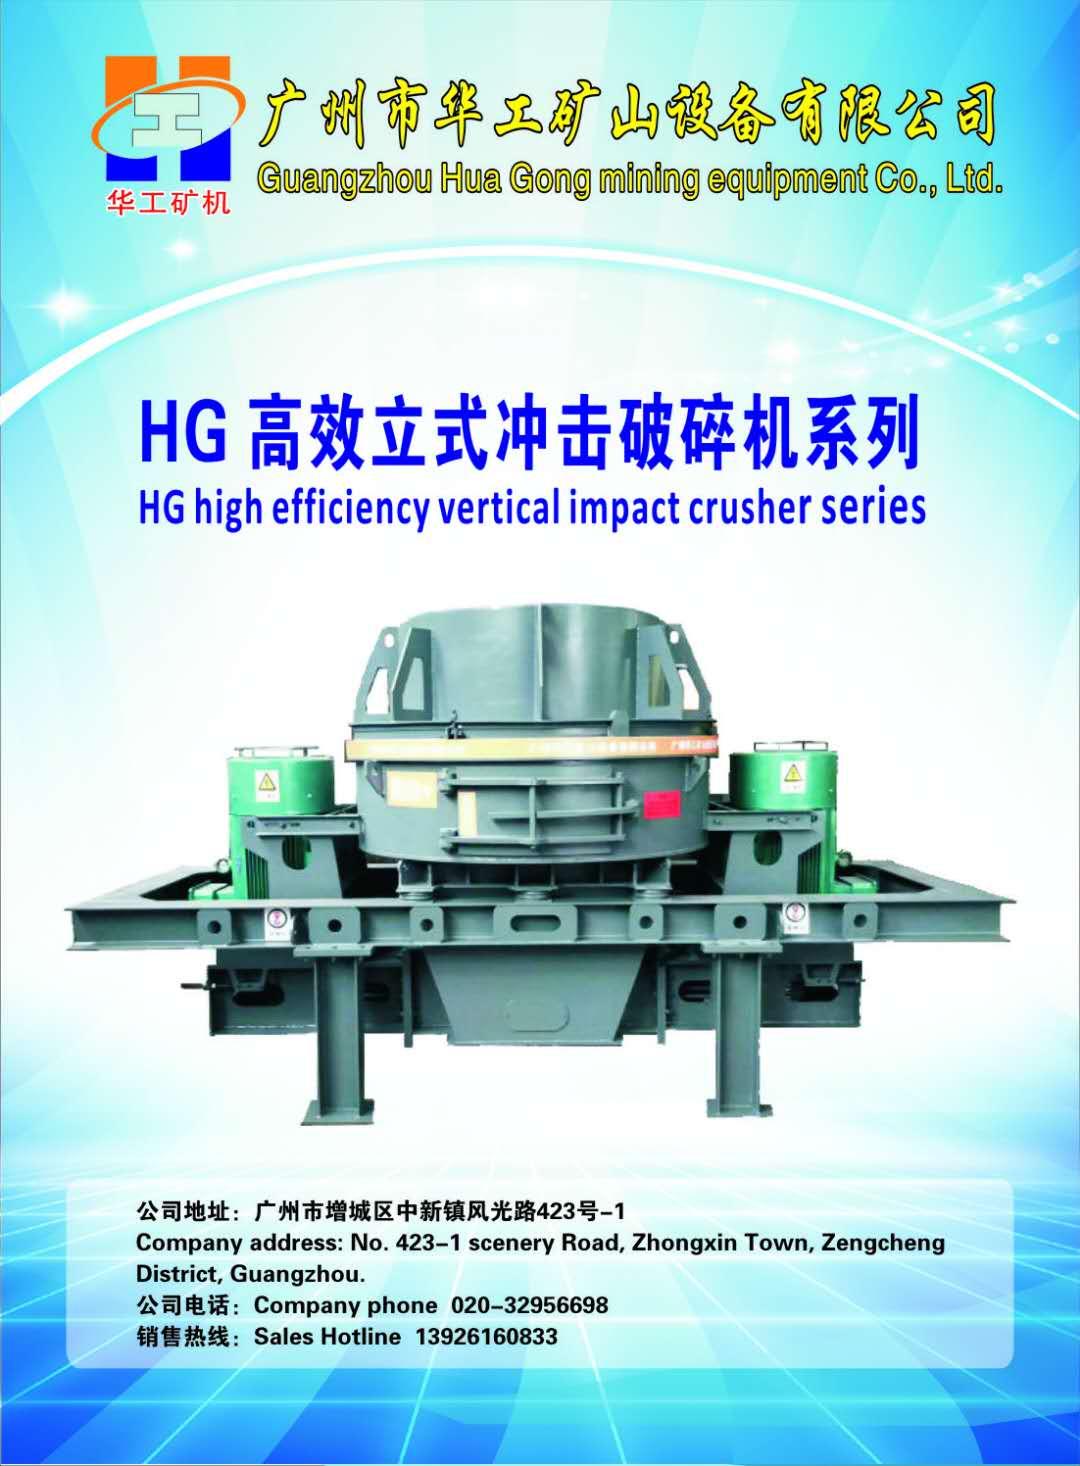 HG高效立式制砂機